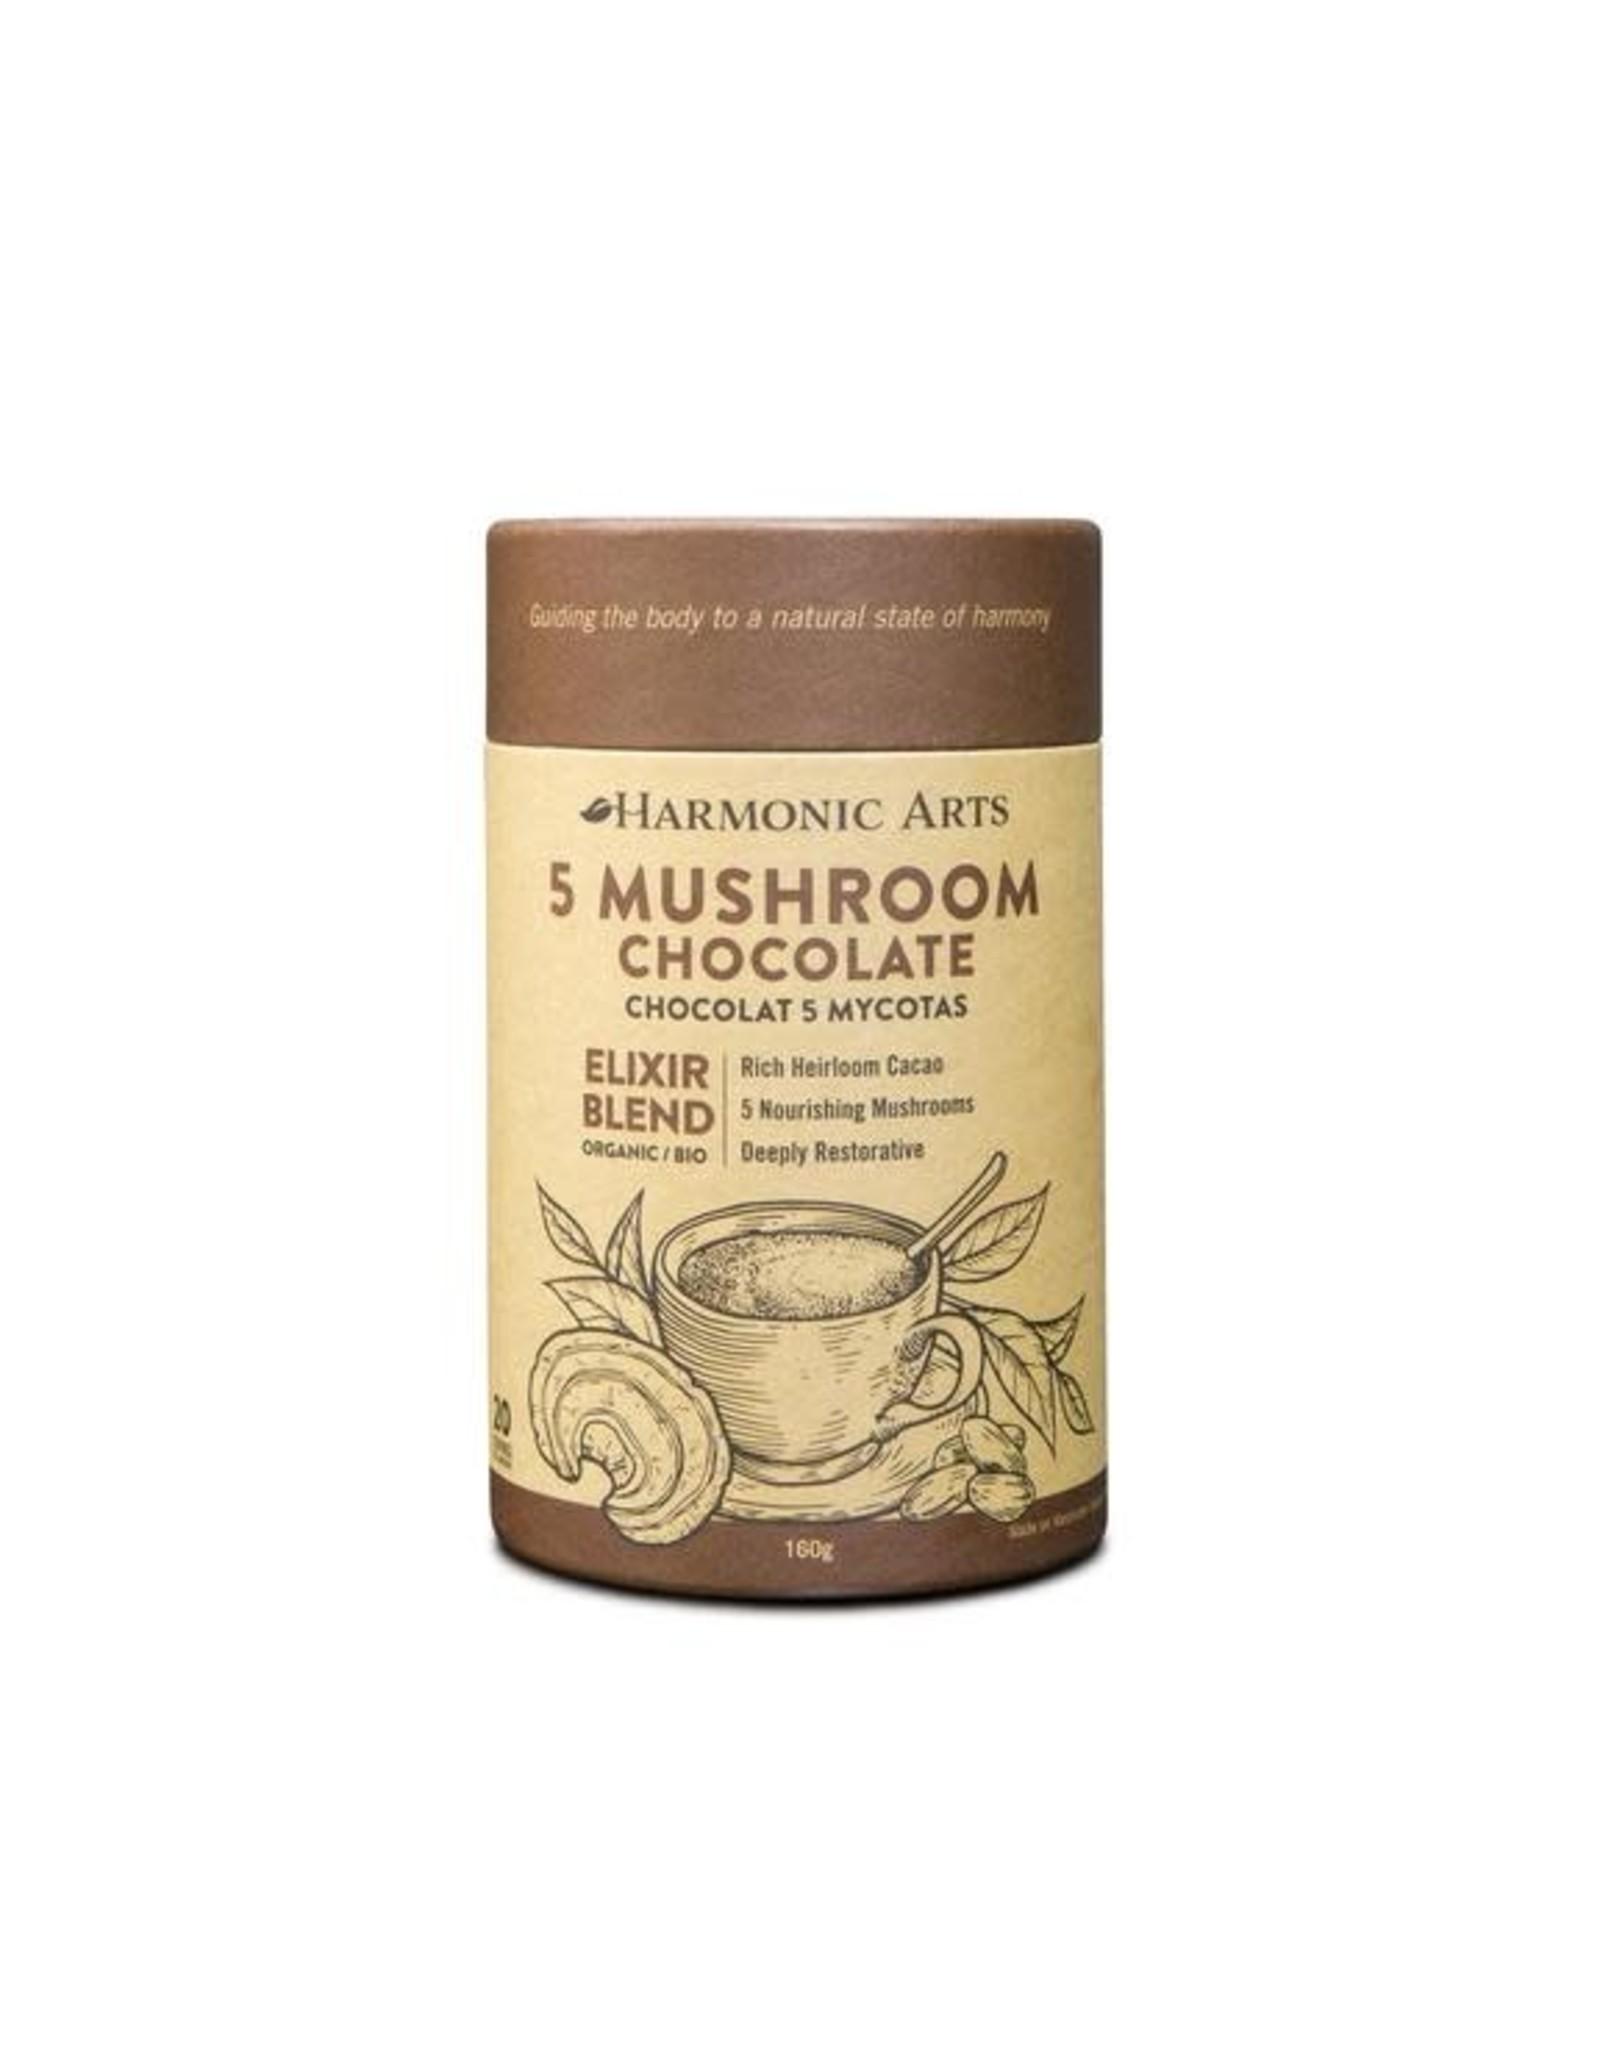 Harmonic Arts 5 Mushroom Drinking Chocolate